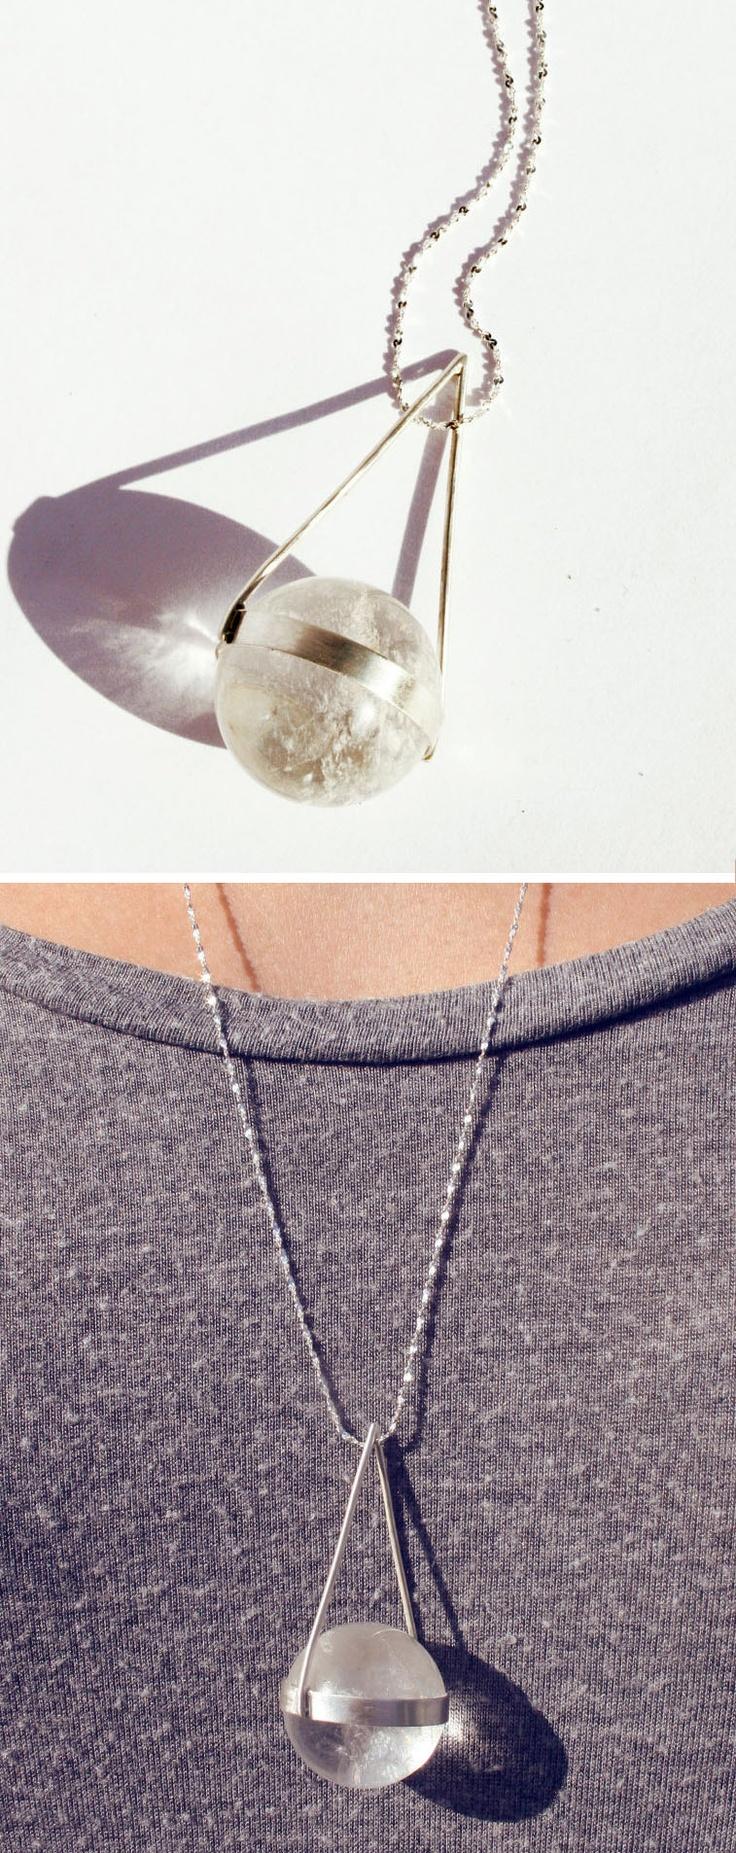 Moon glow orb necklace / StefanieSheehan on etsy